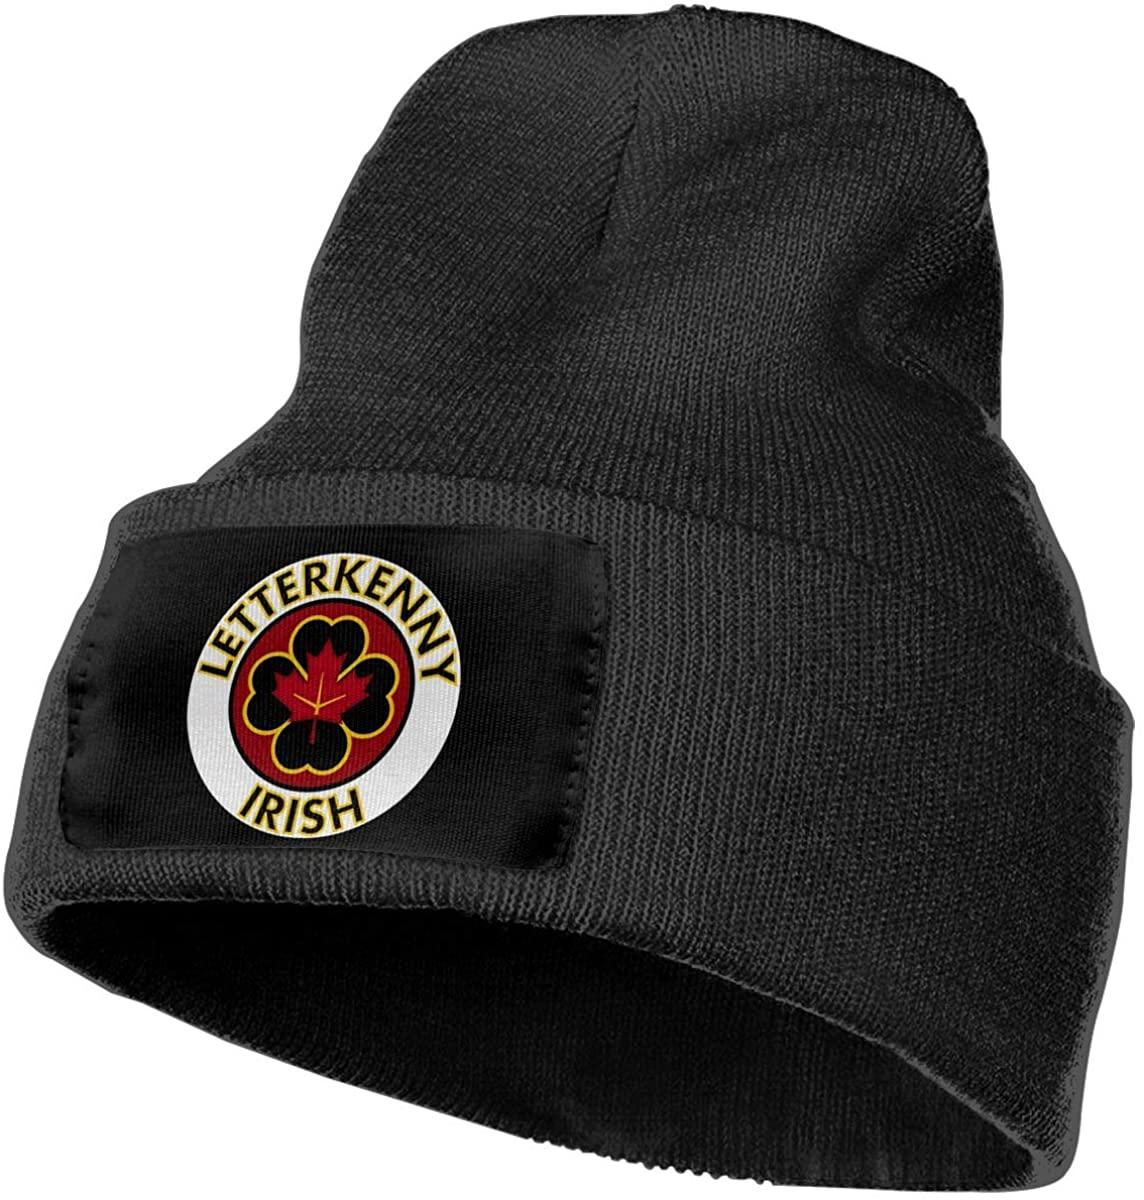 CAPADANA Letterkenny Irish Mens Beanie Cap Skull Cap Winter Warm Knitting Hats.